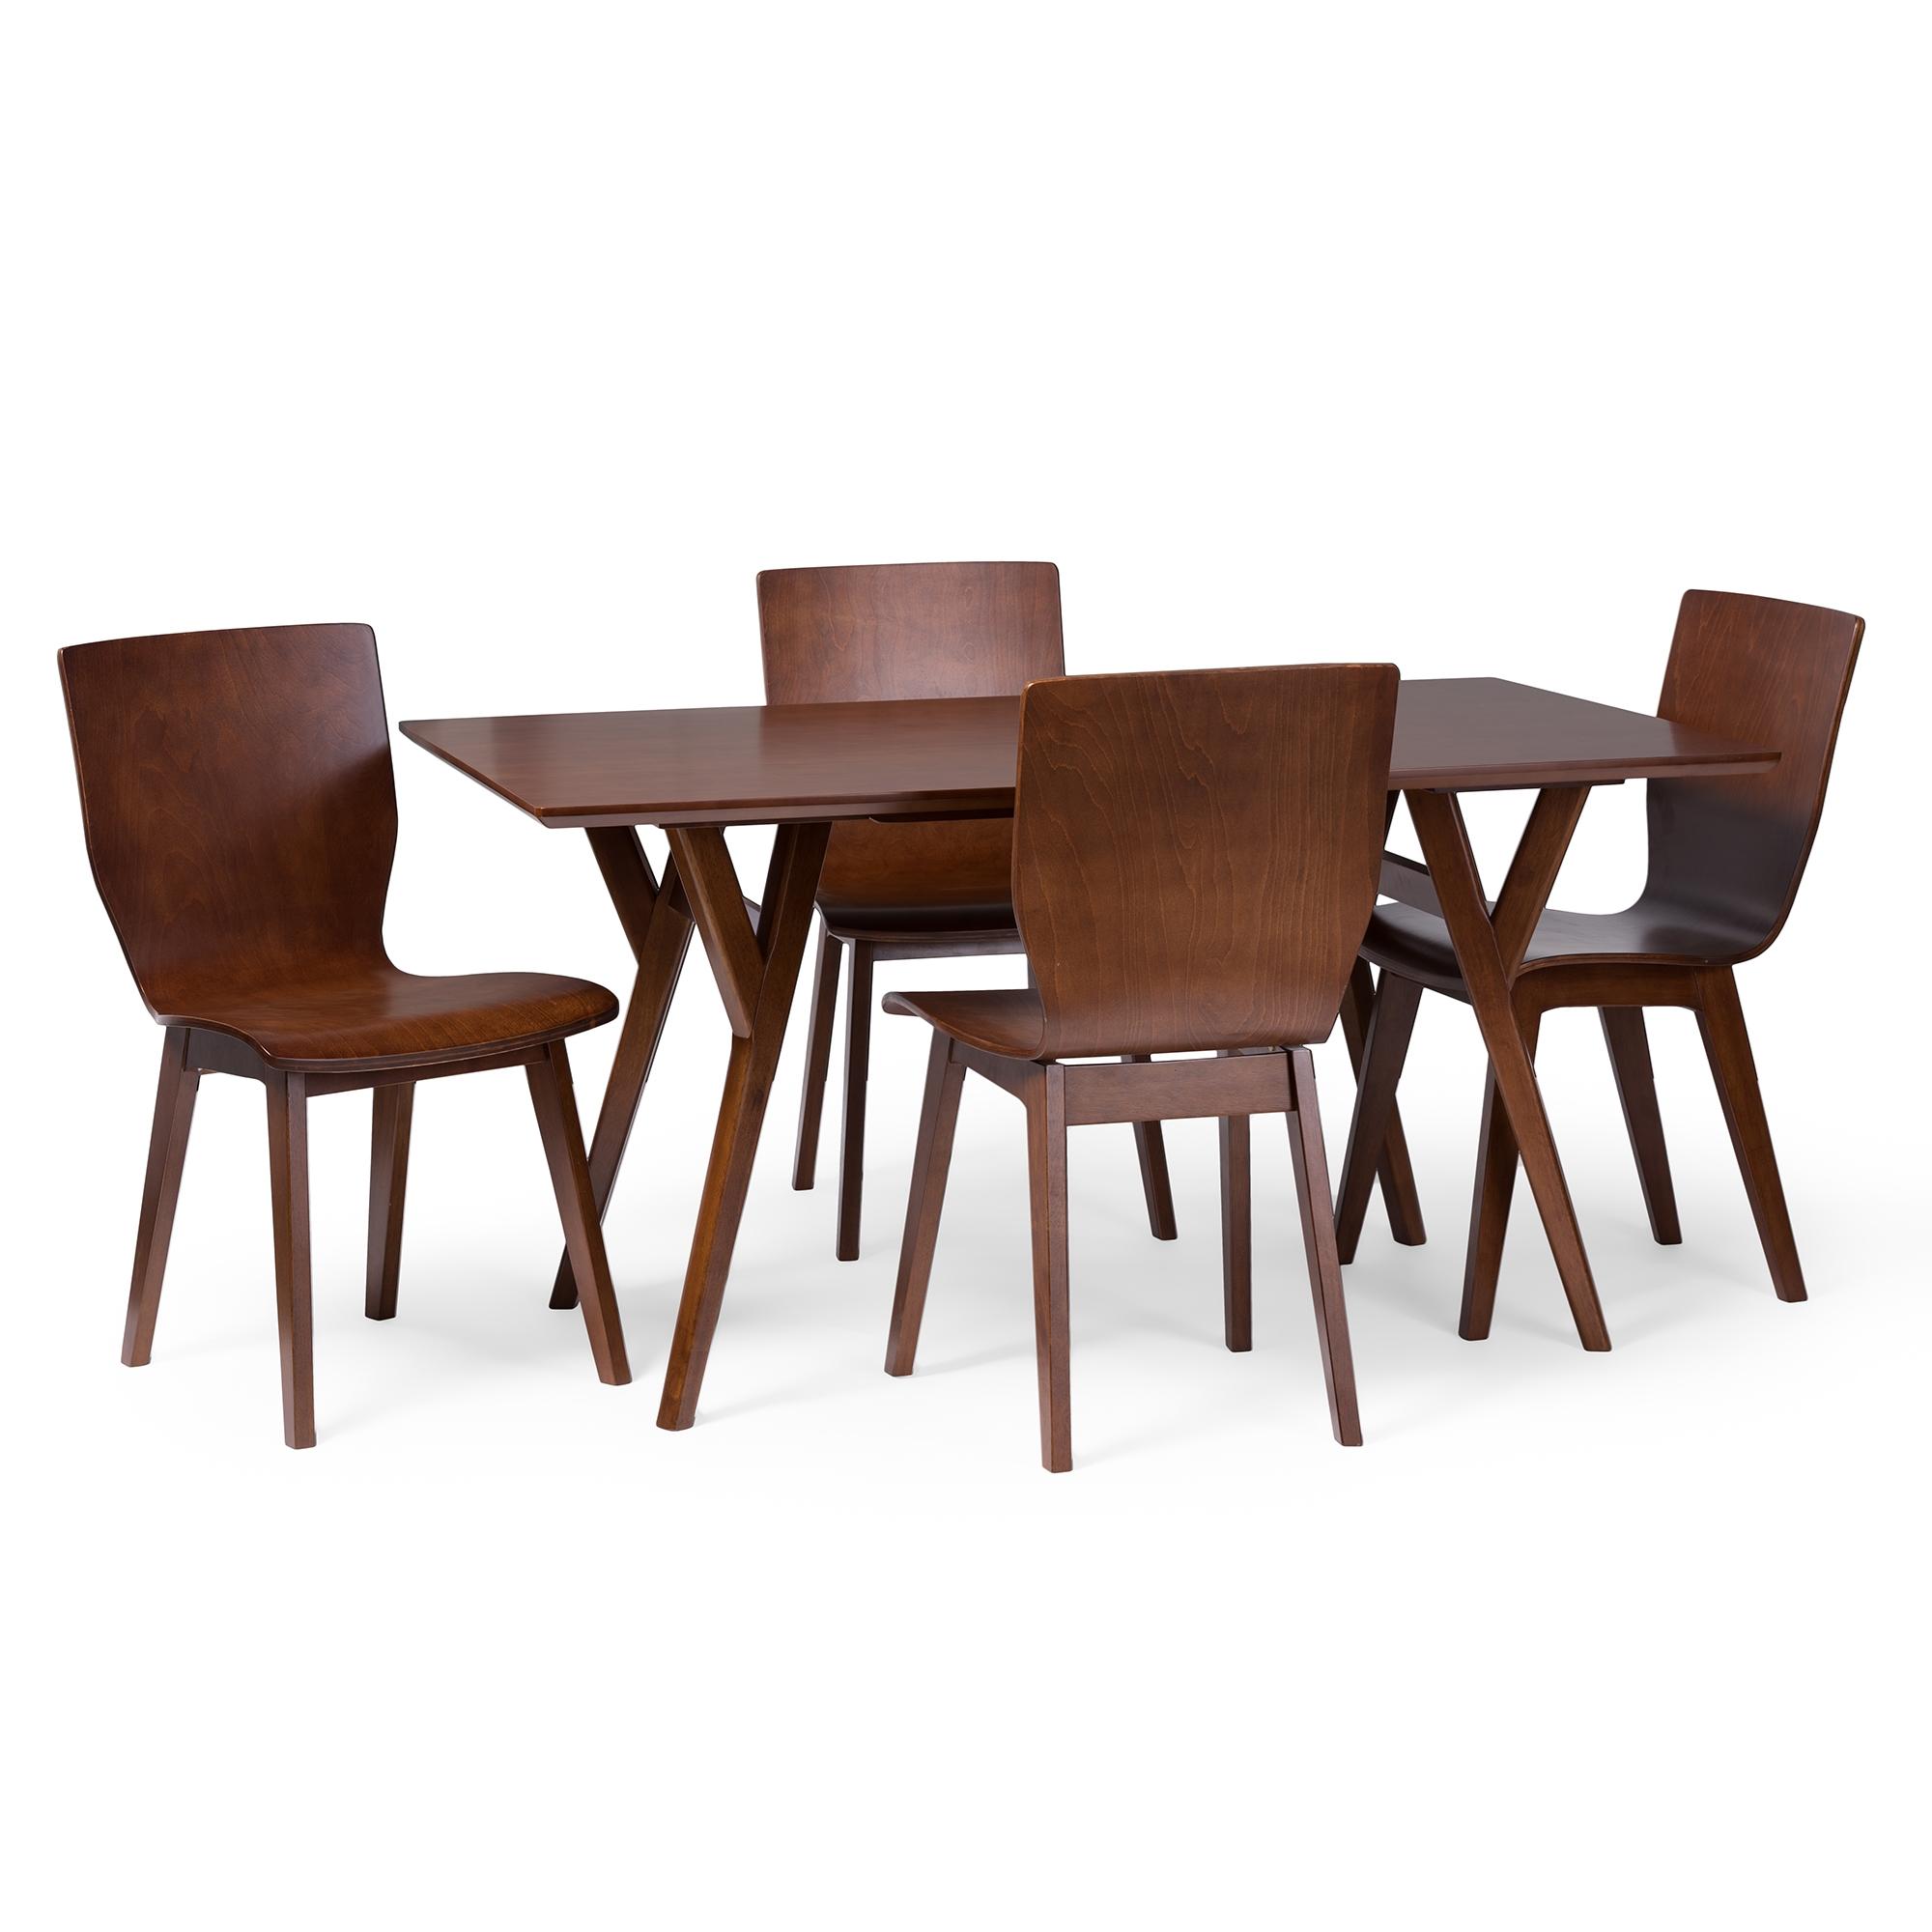 Beautiful Baxton Studio | Wholesale Dining Table | Wholesale Dining Room Furniture | Wholesale  Furniture